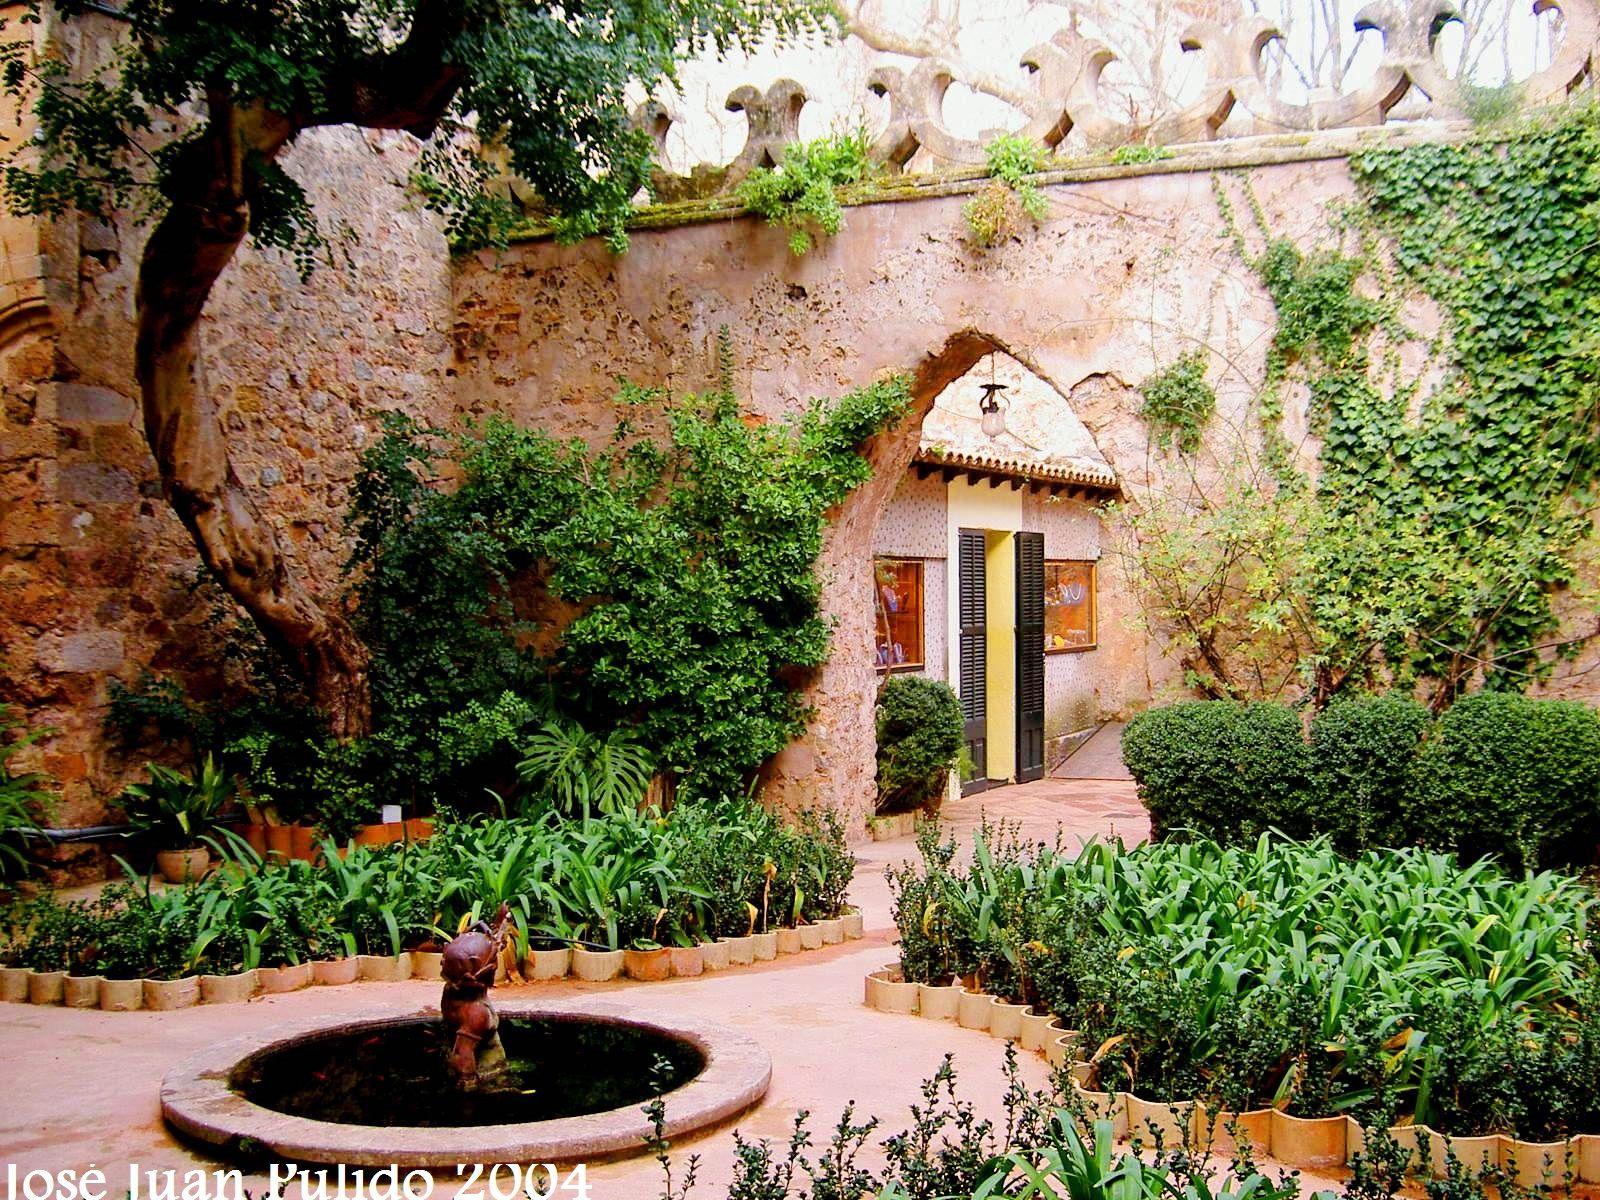 Jardines de la cartuja de valldemossa en mallorca for Jardines de la cartuja